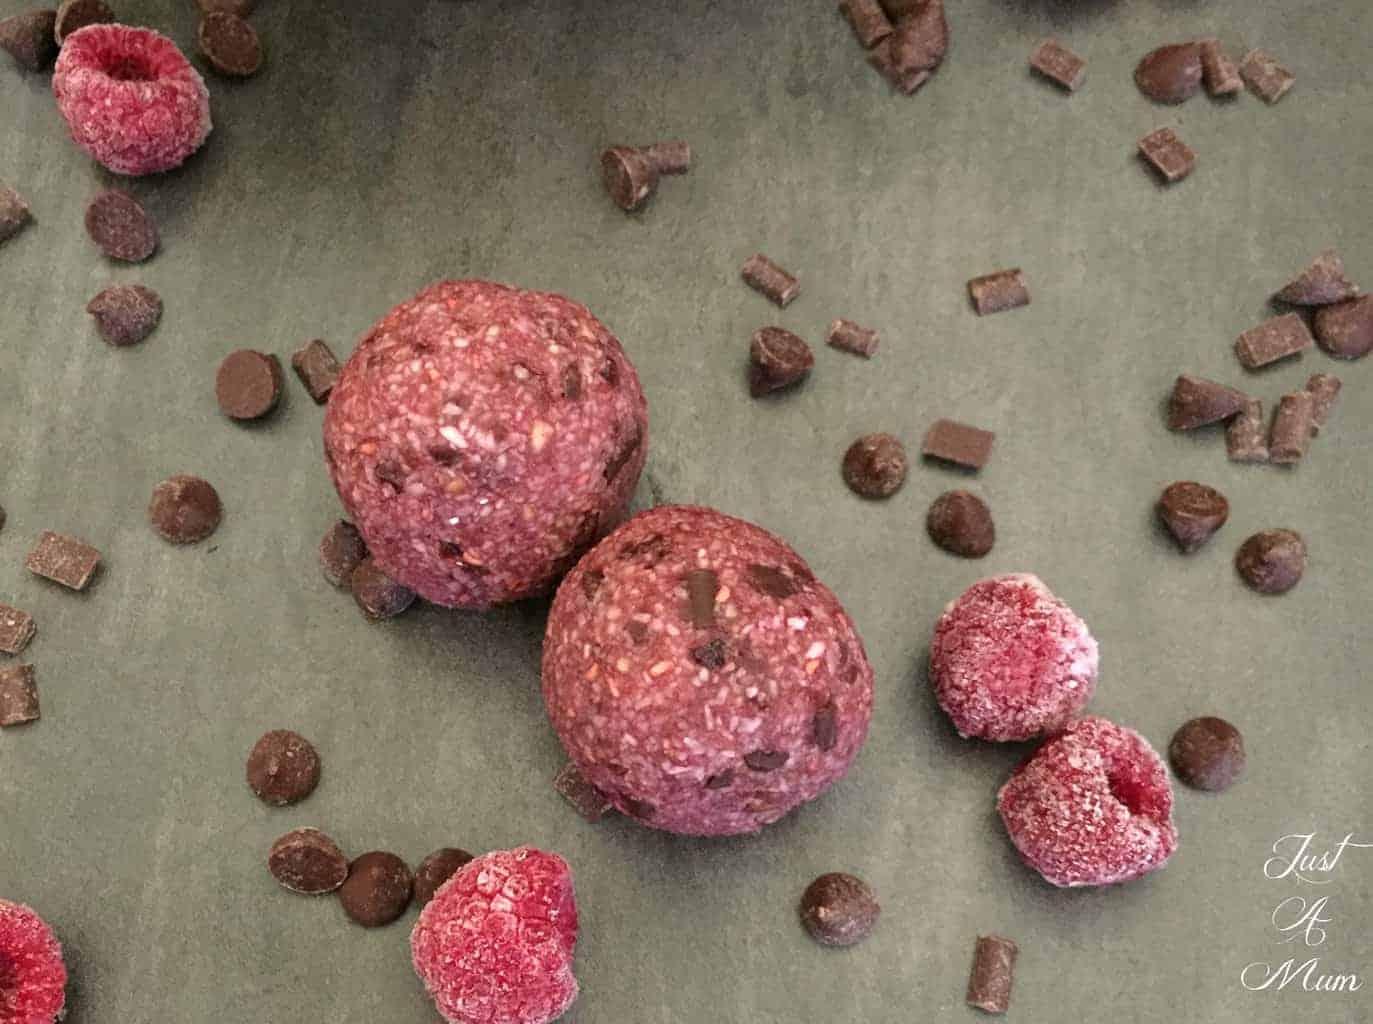 raspberry-chocolate-bliss-balls-5